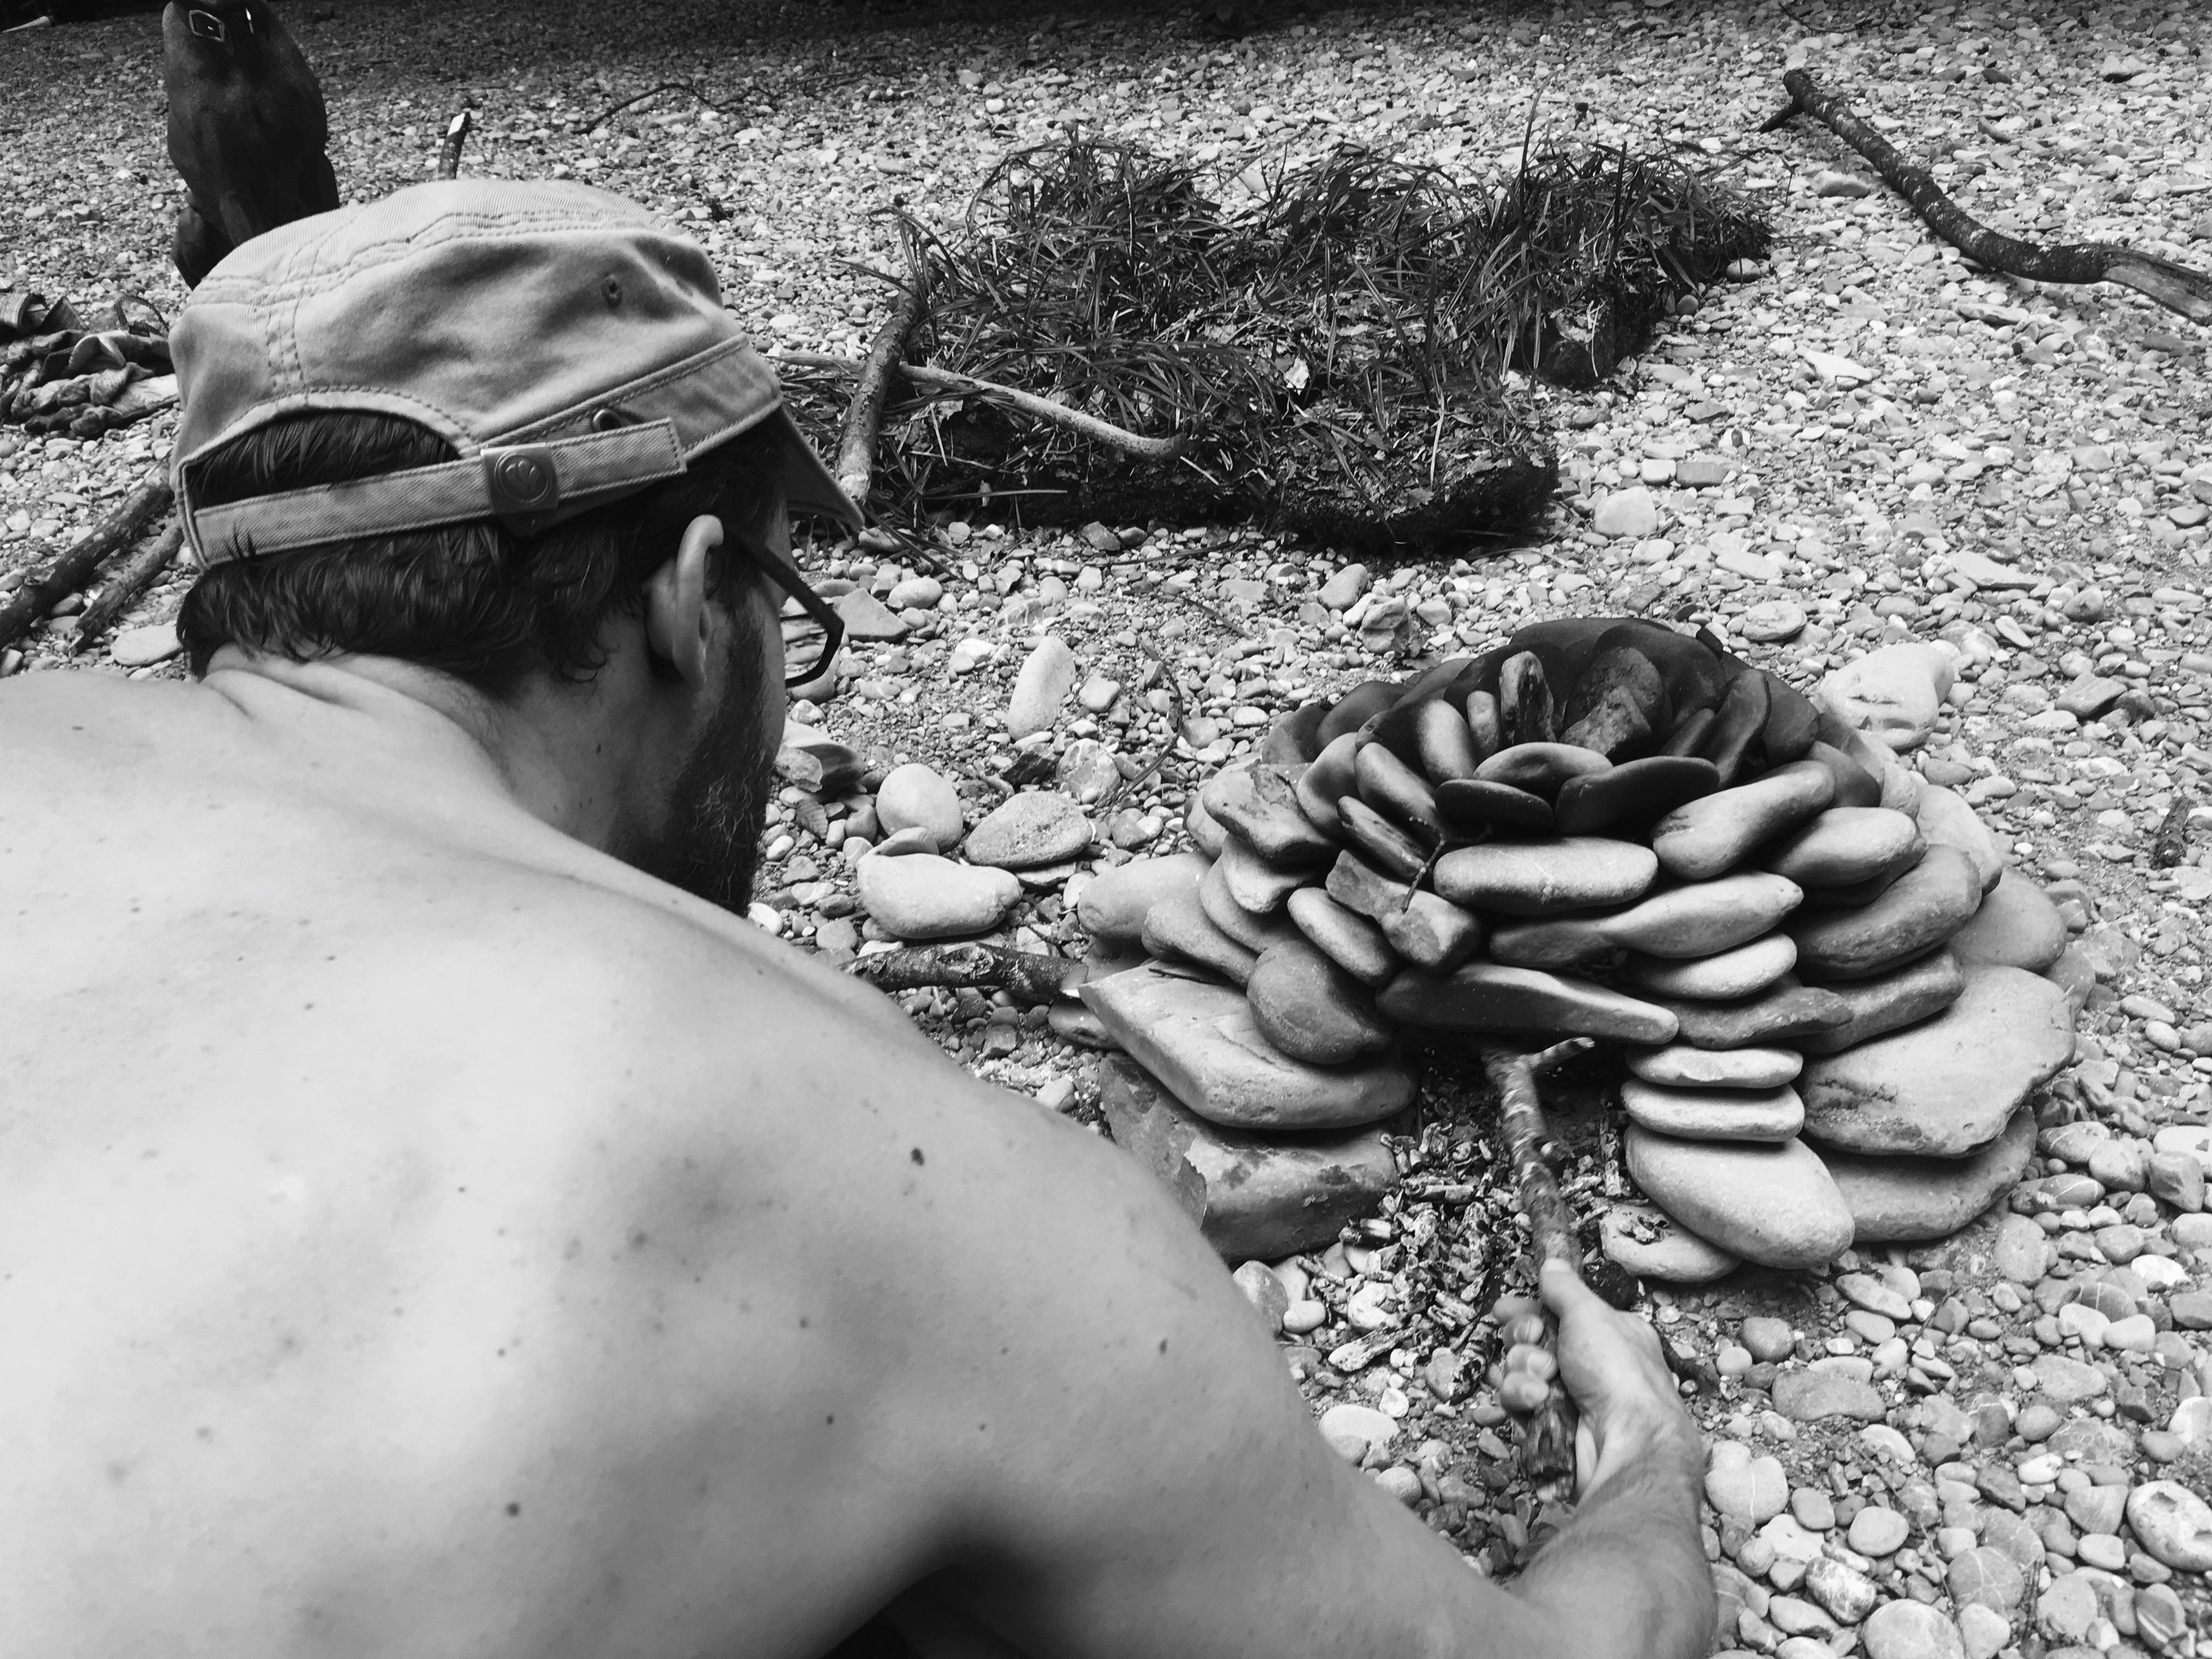 Mikroabenteuer am Feuer